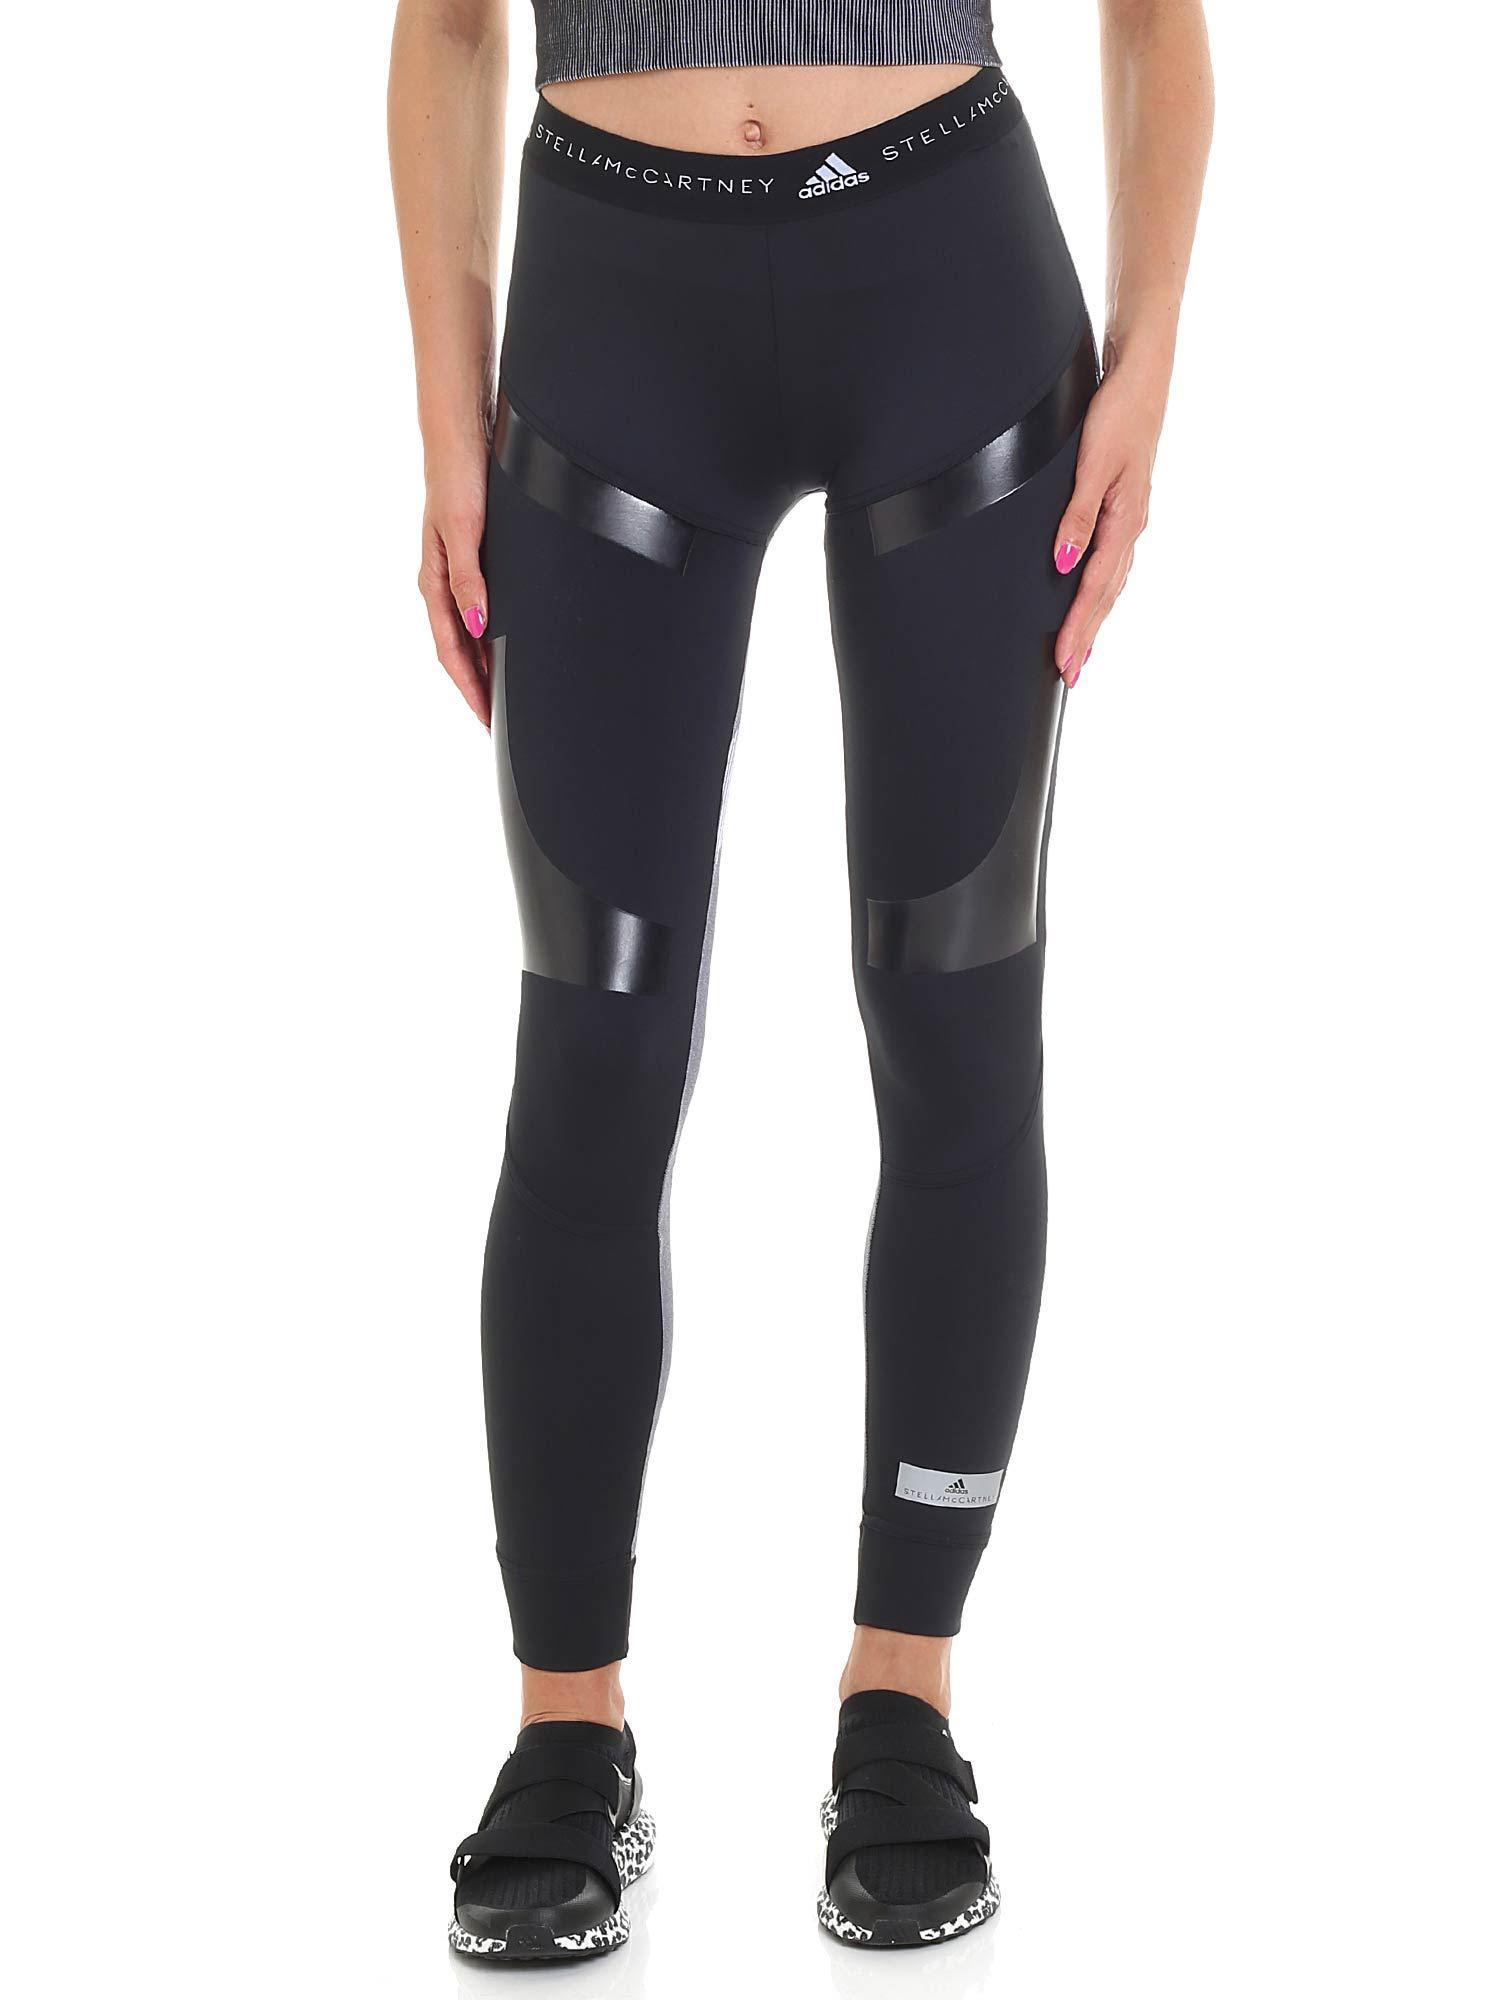 Mccartney White Run Black Leggings Tight And By Stella Ultra Adidas nTxFaqXU